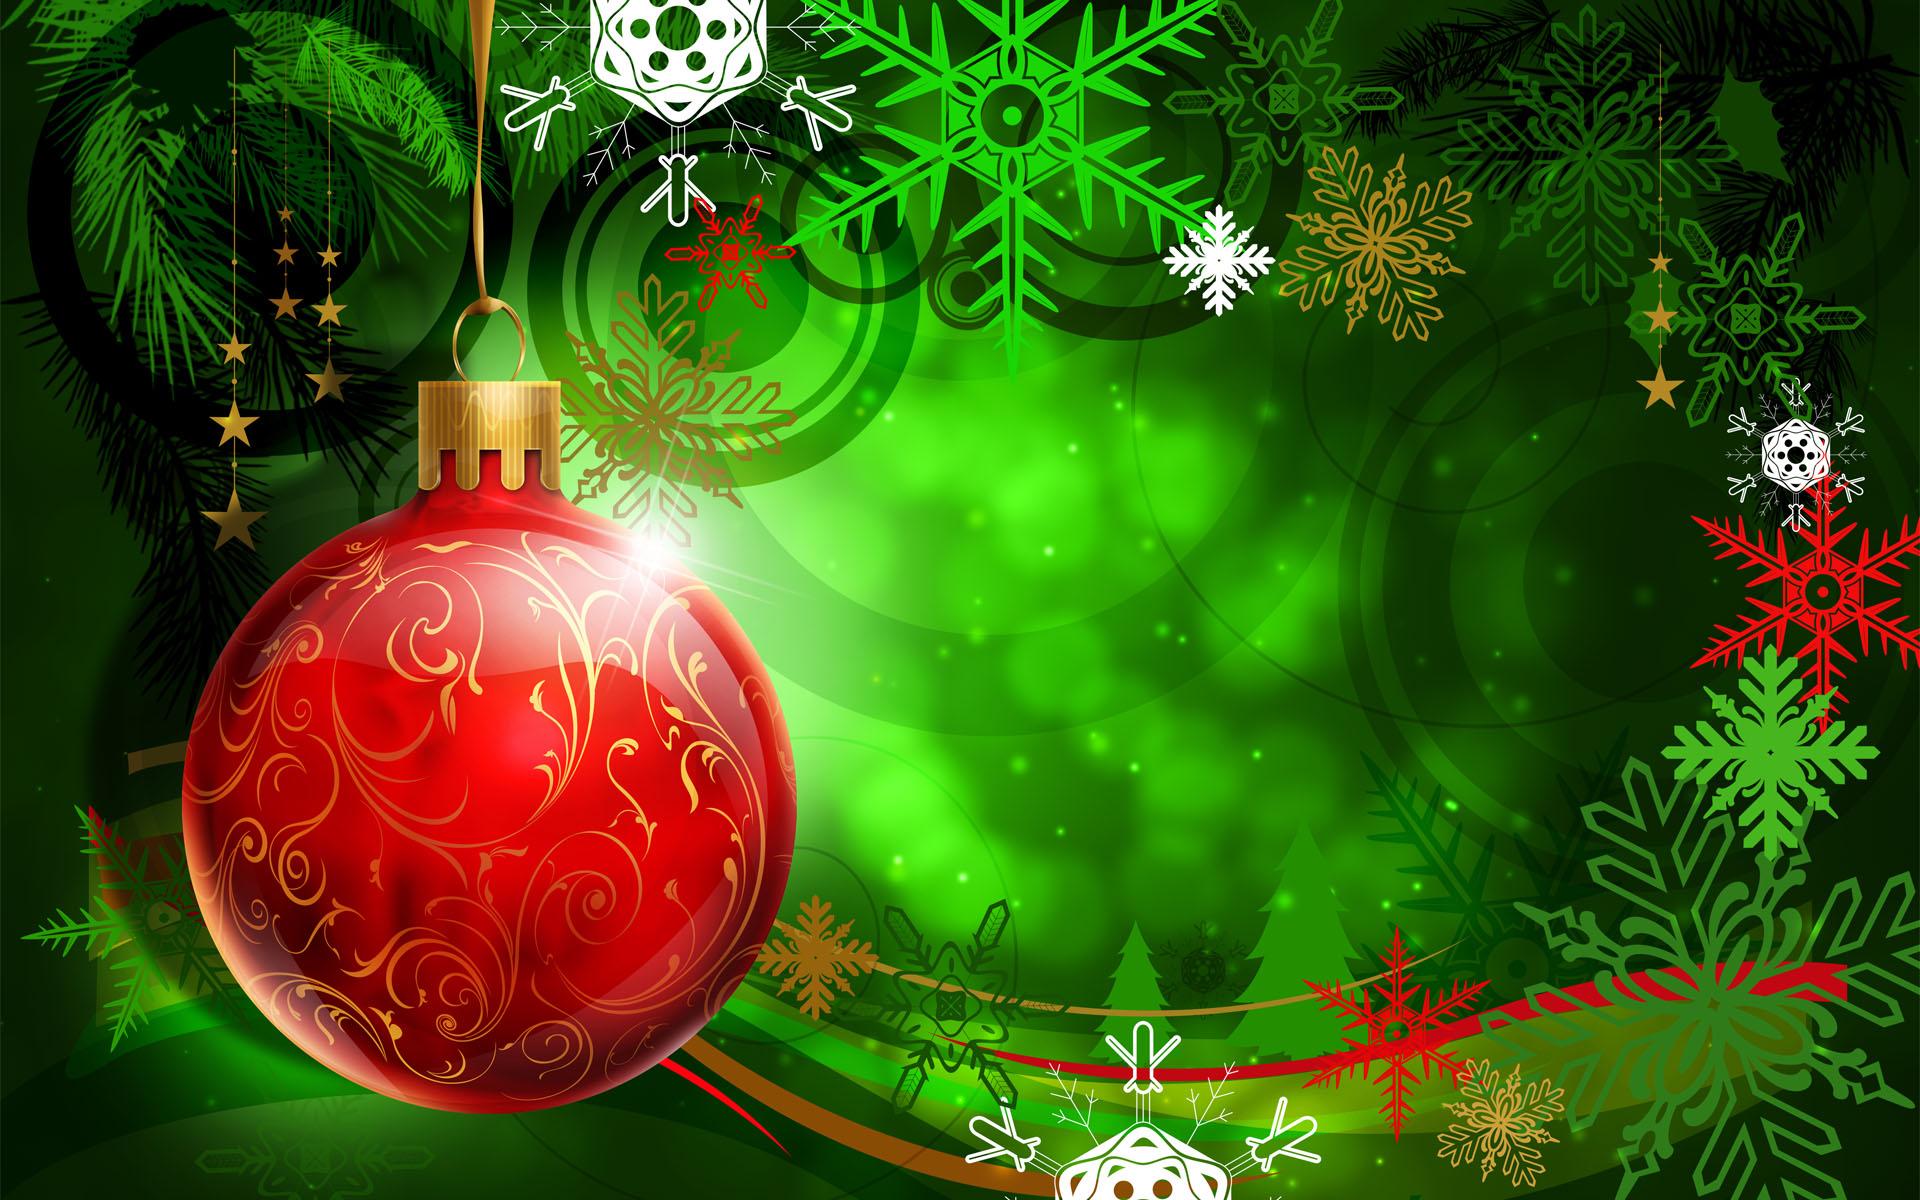 HD Colorful Christmas Decoration Screensaver Backgrounds   Ventubecom 1920x1200